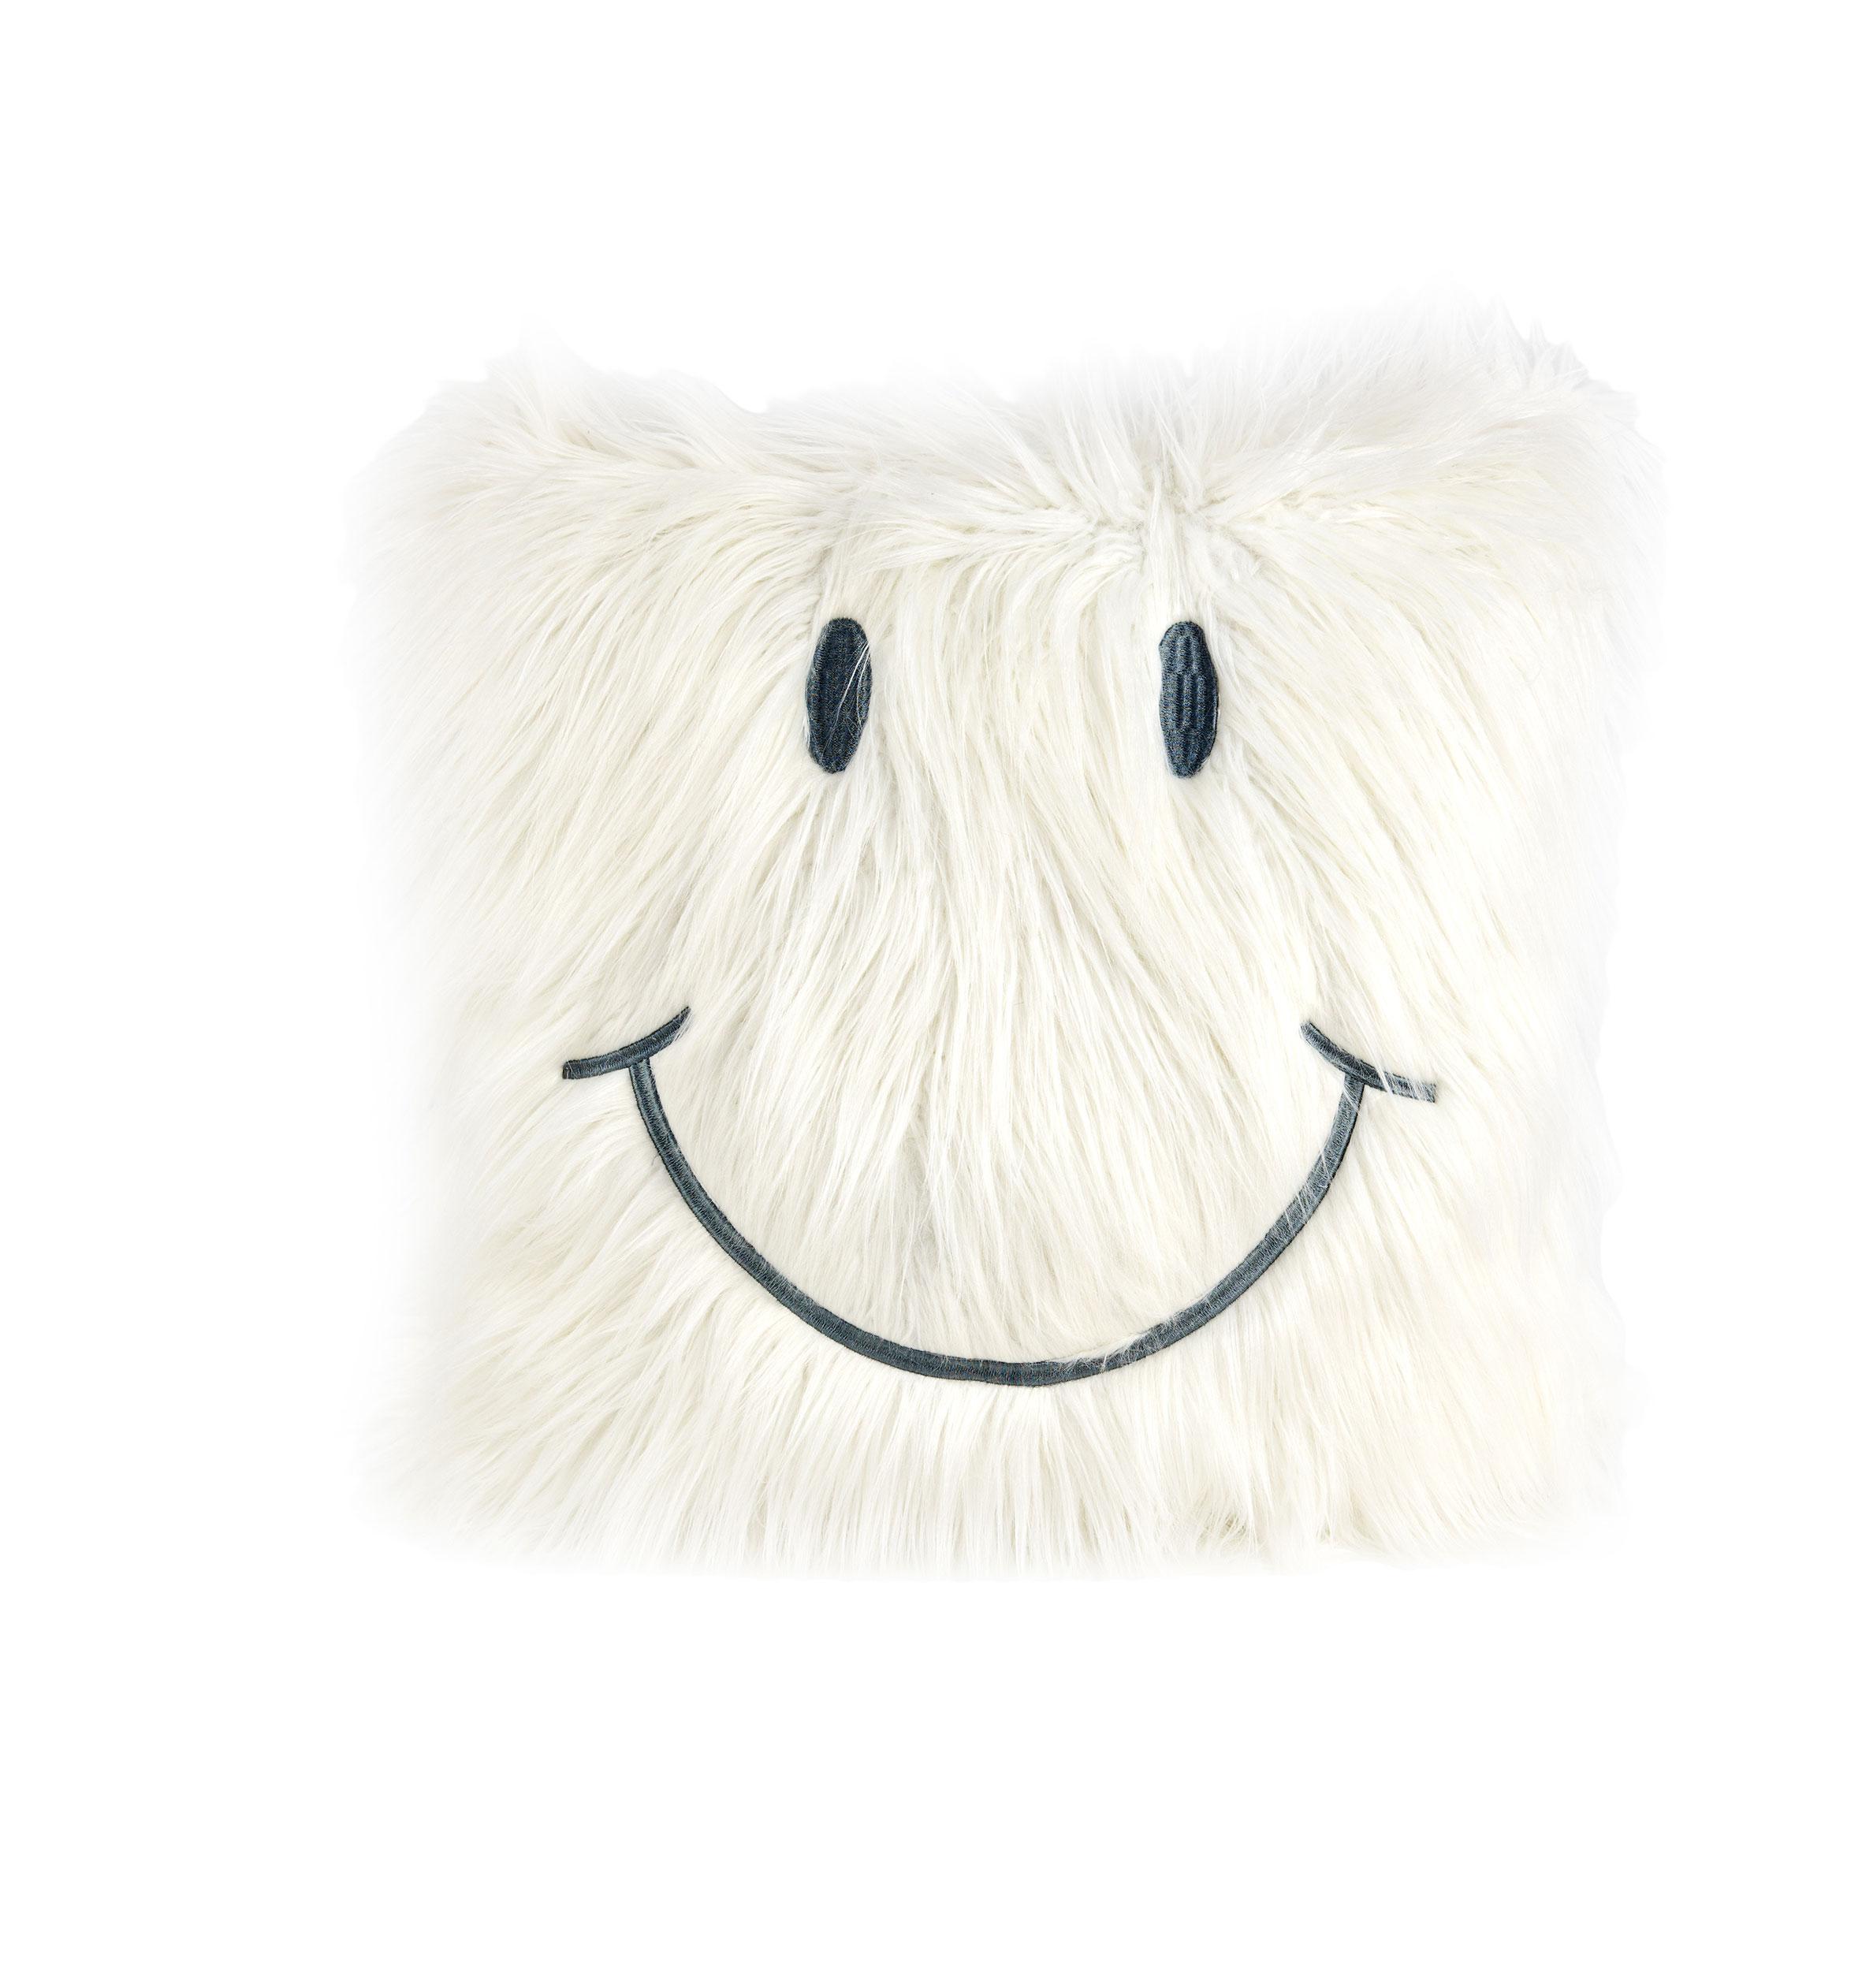 dekokissen smiley 50x50 cm cloud dancer gray ohne. Black Bedroom Furniture Sets. Home Design Ideas